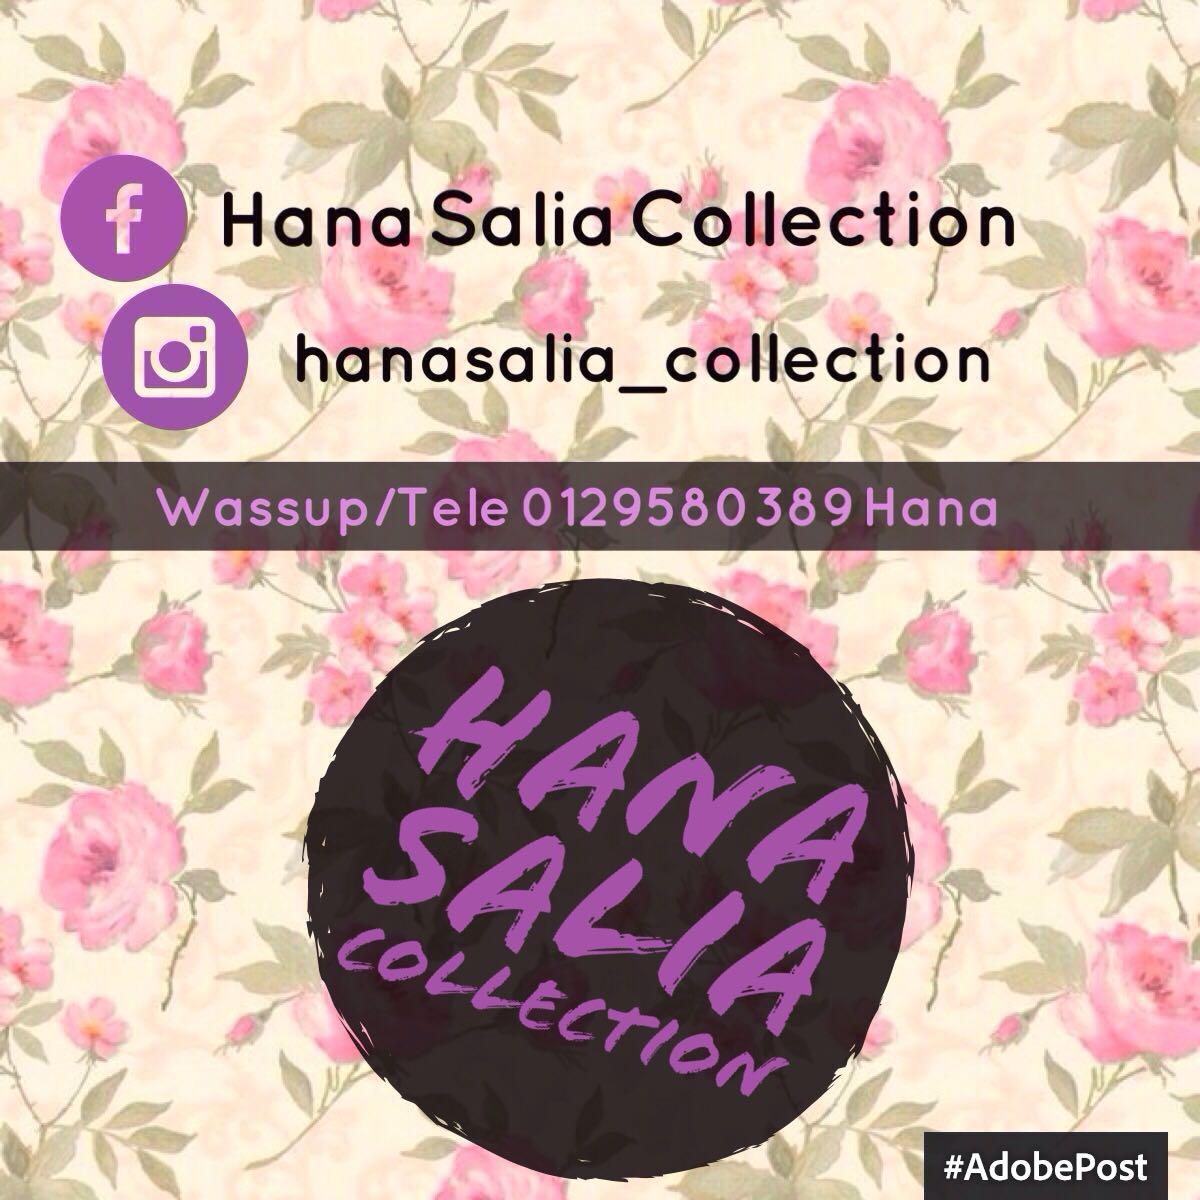 hanasaliacollection